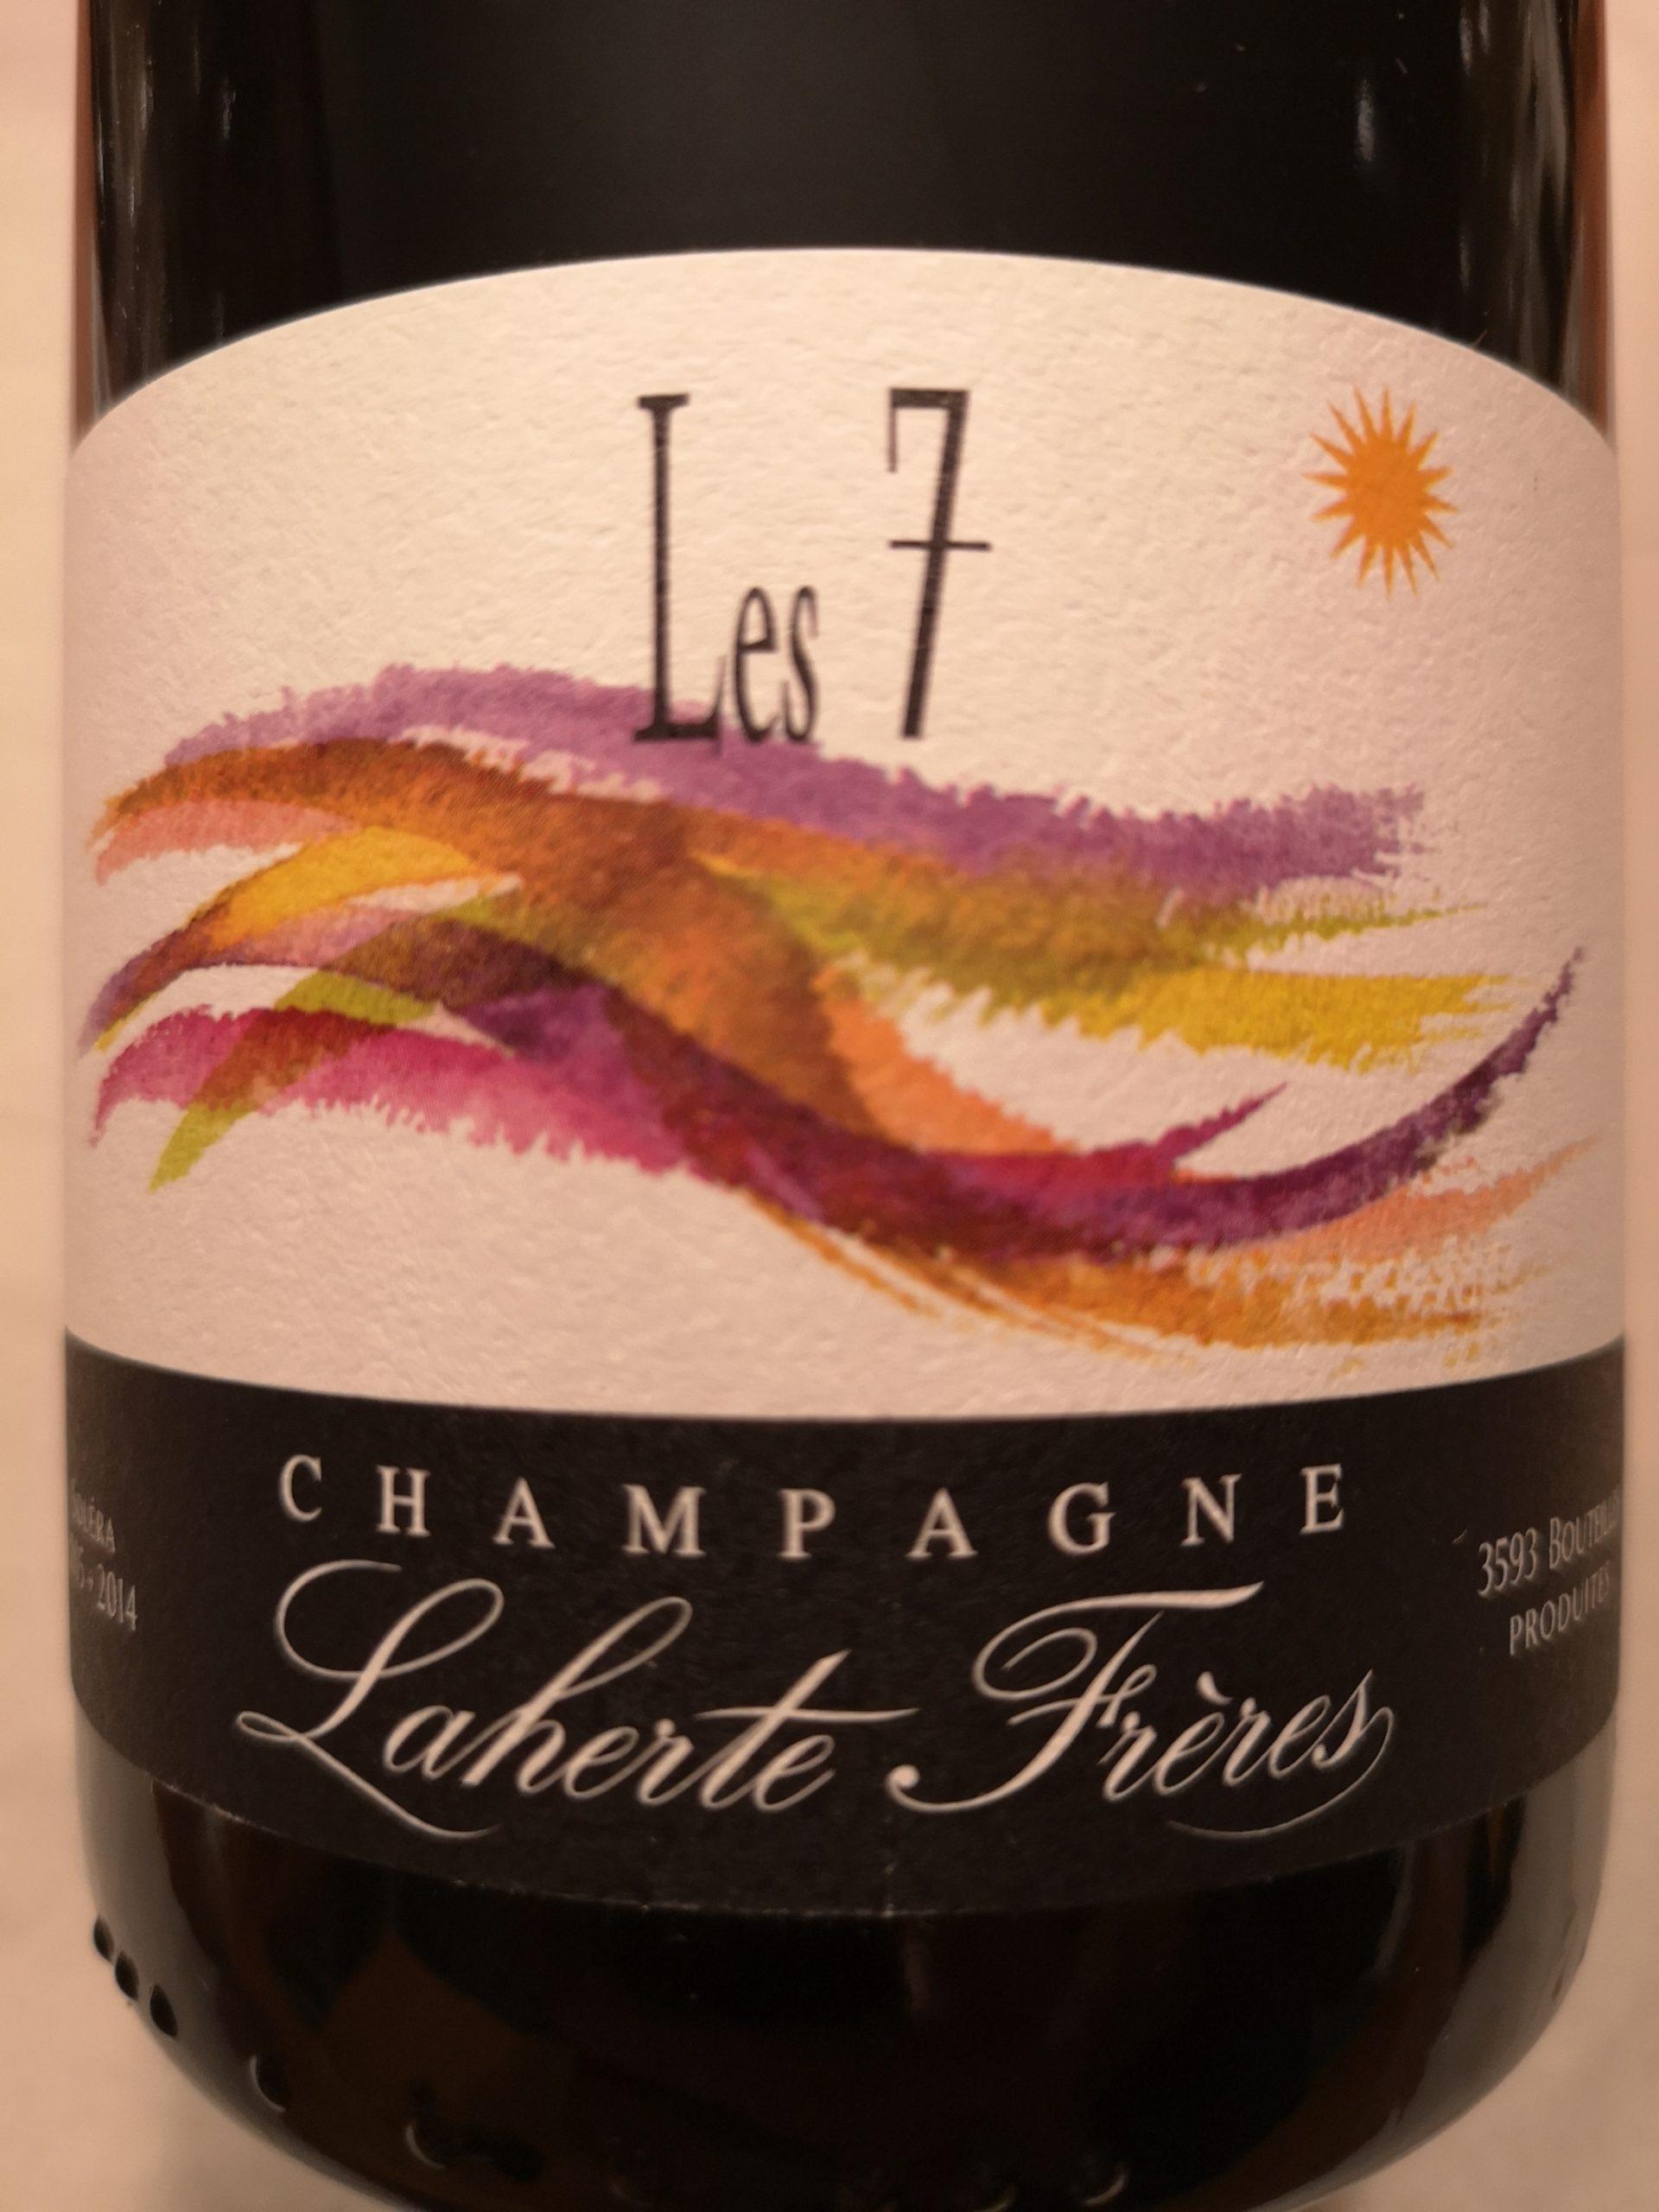 -nv- Champagne Les 7 Solera EB | Laherte Frères